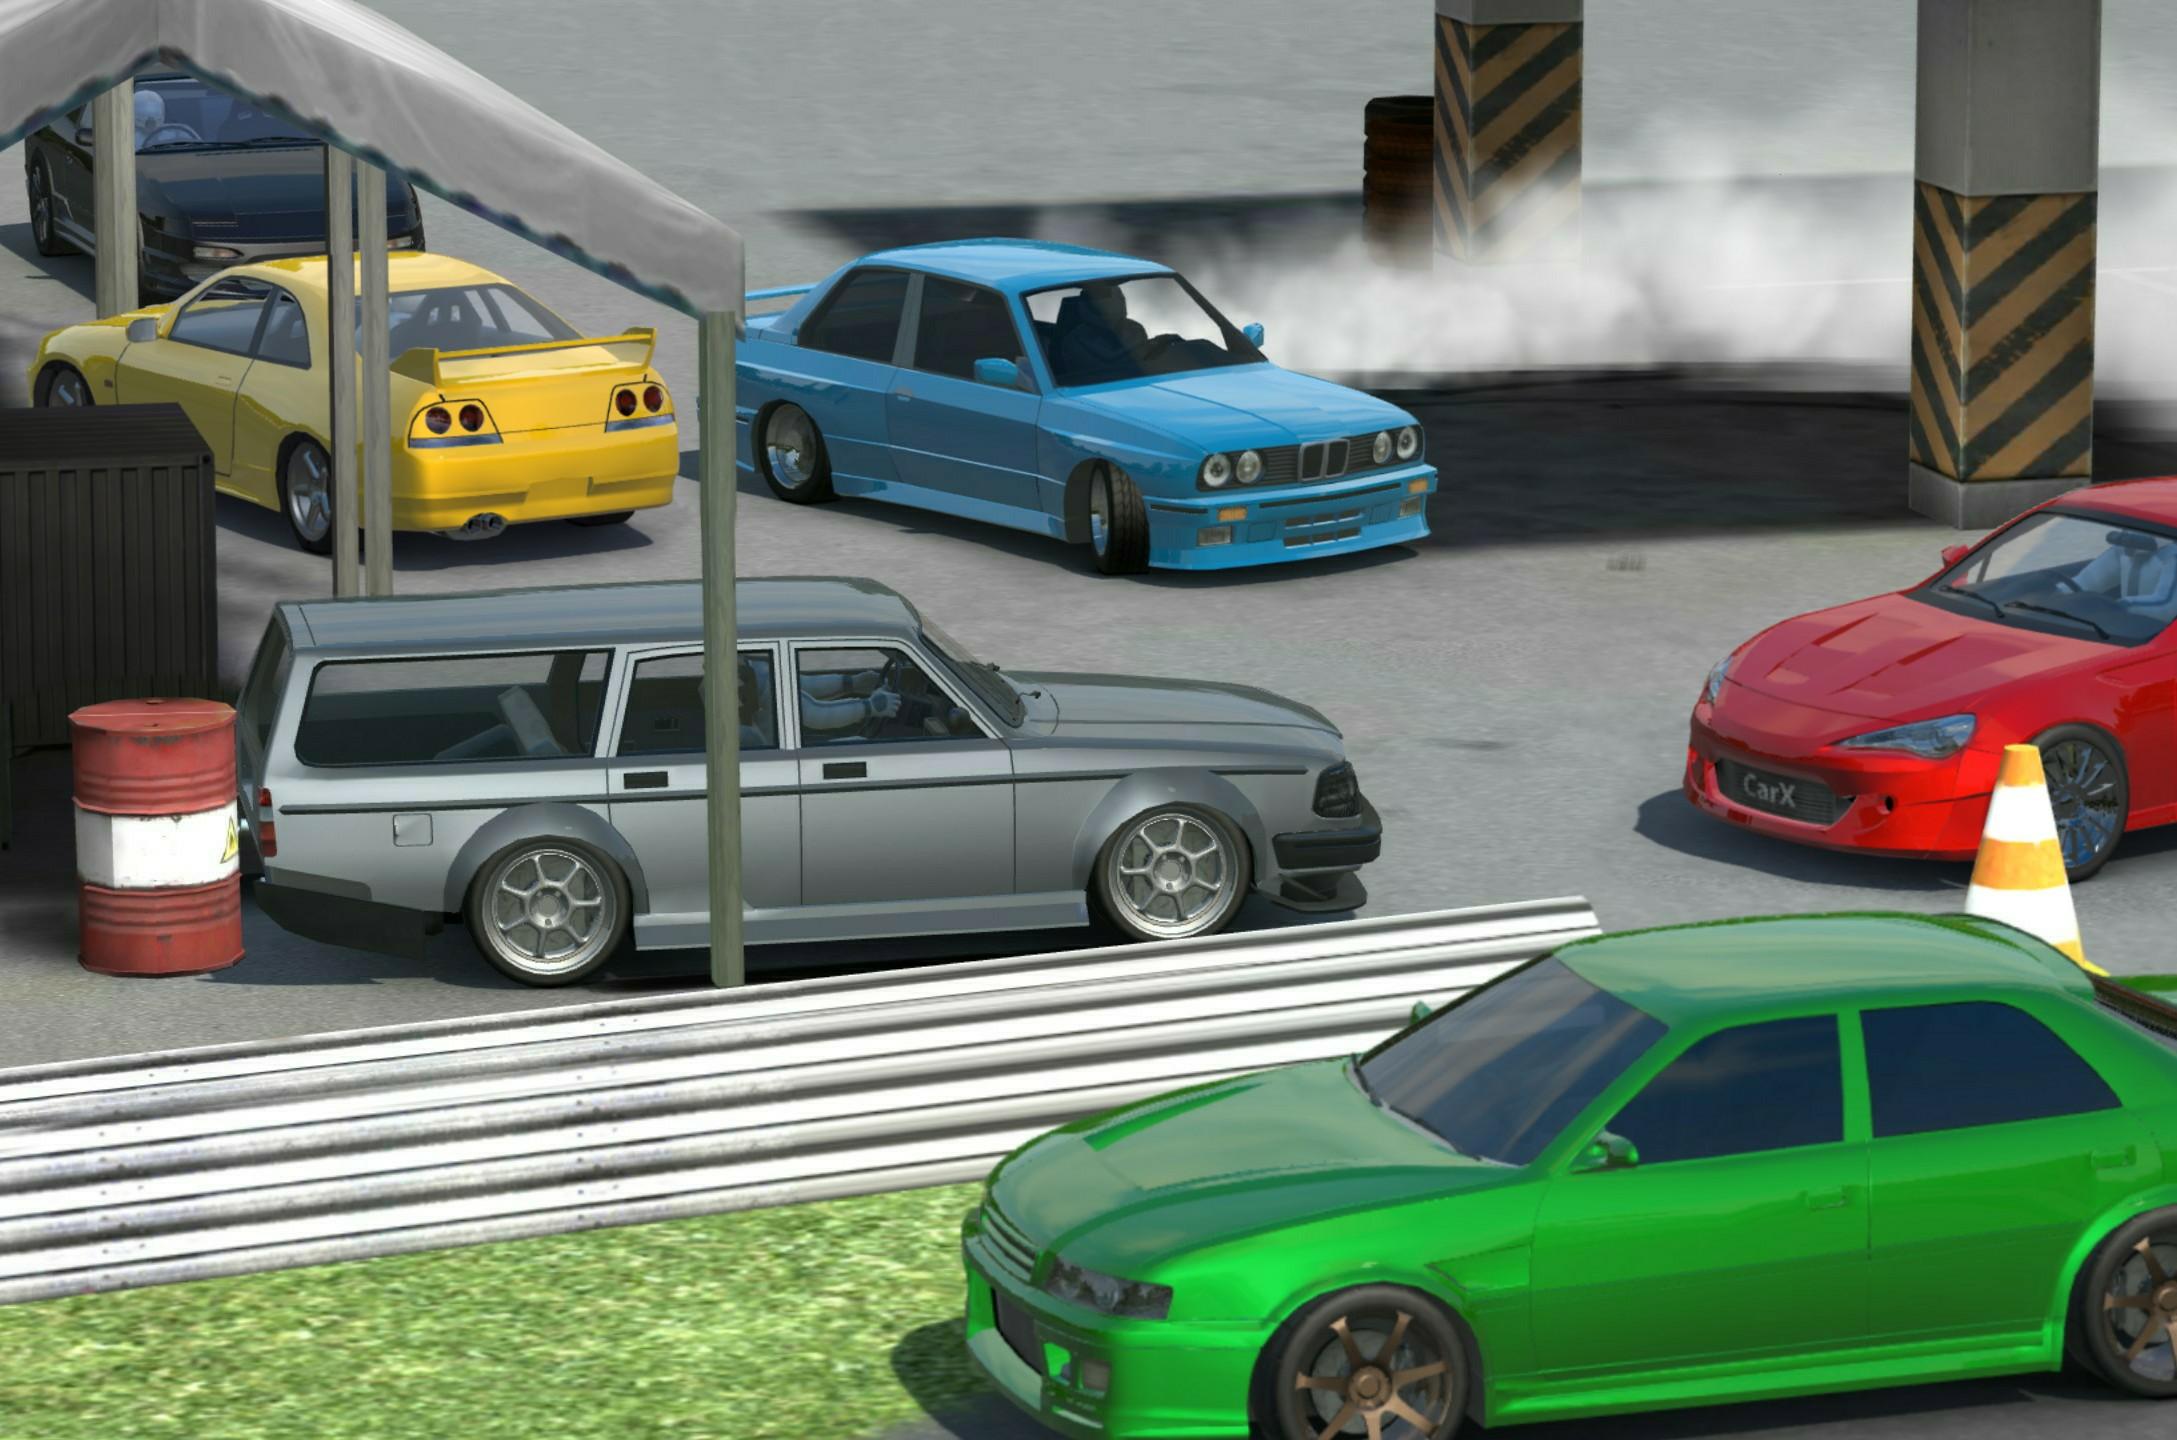 Car X Drift Racing New Cars By On Deviantart